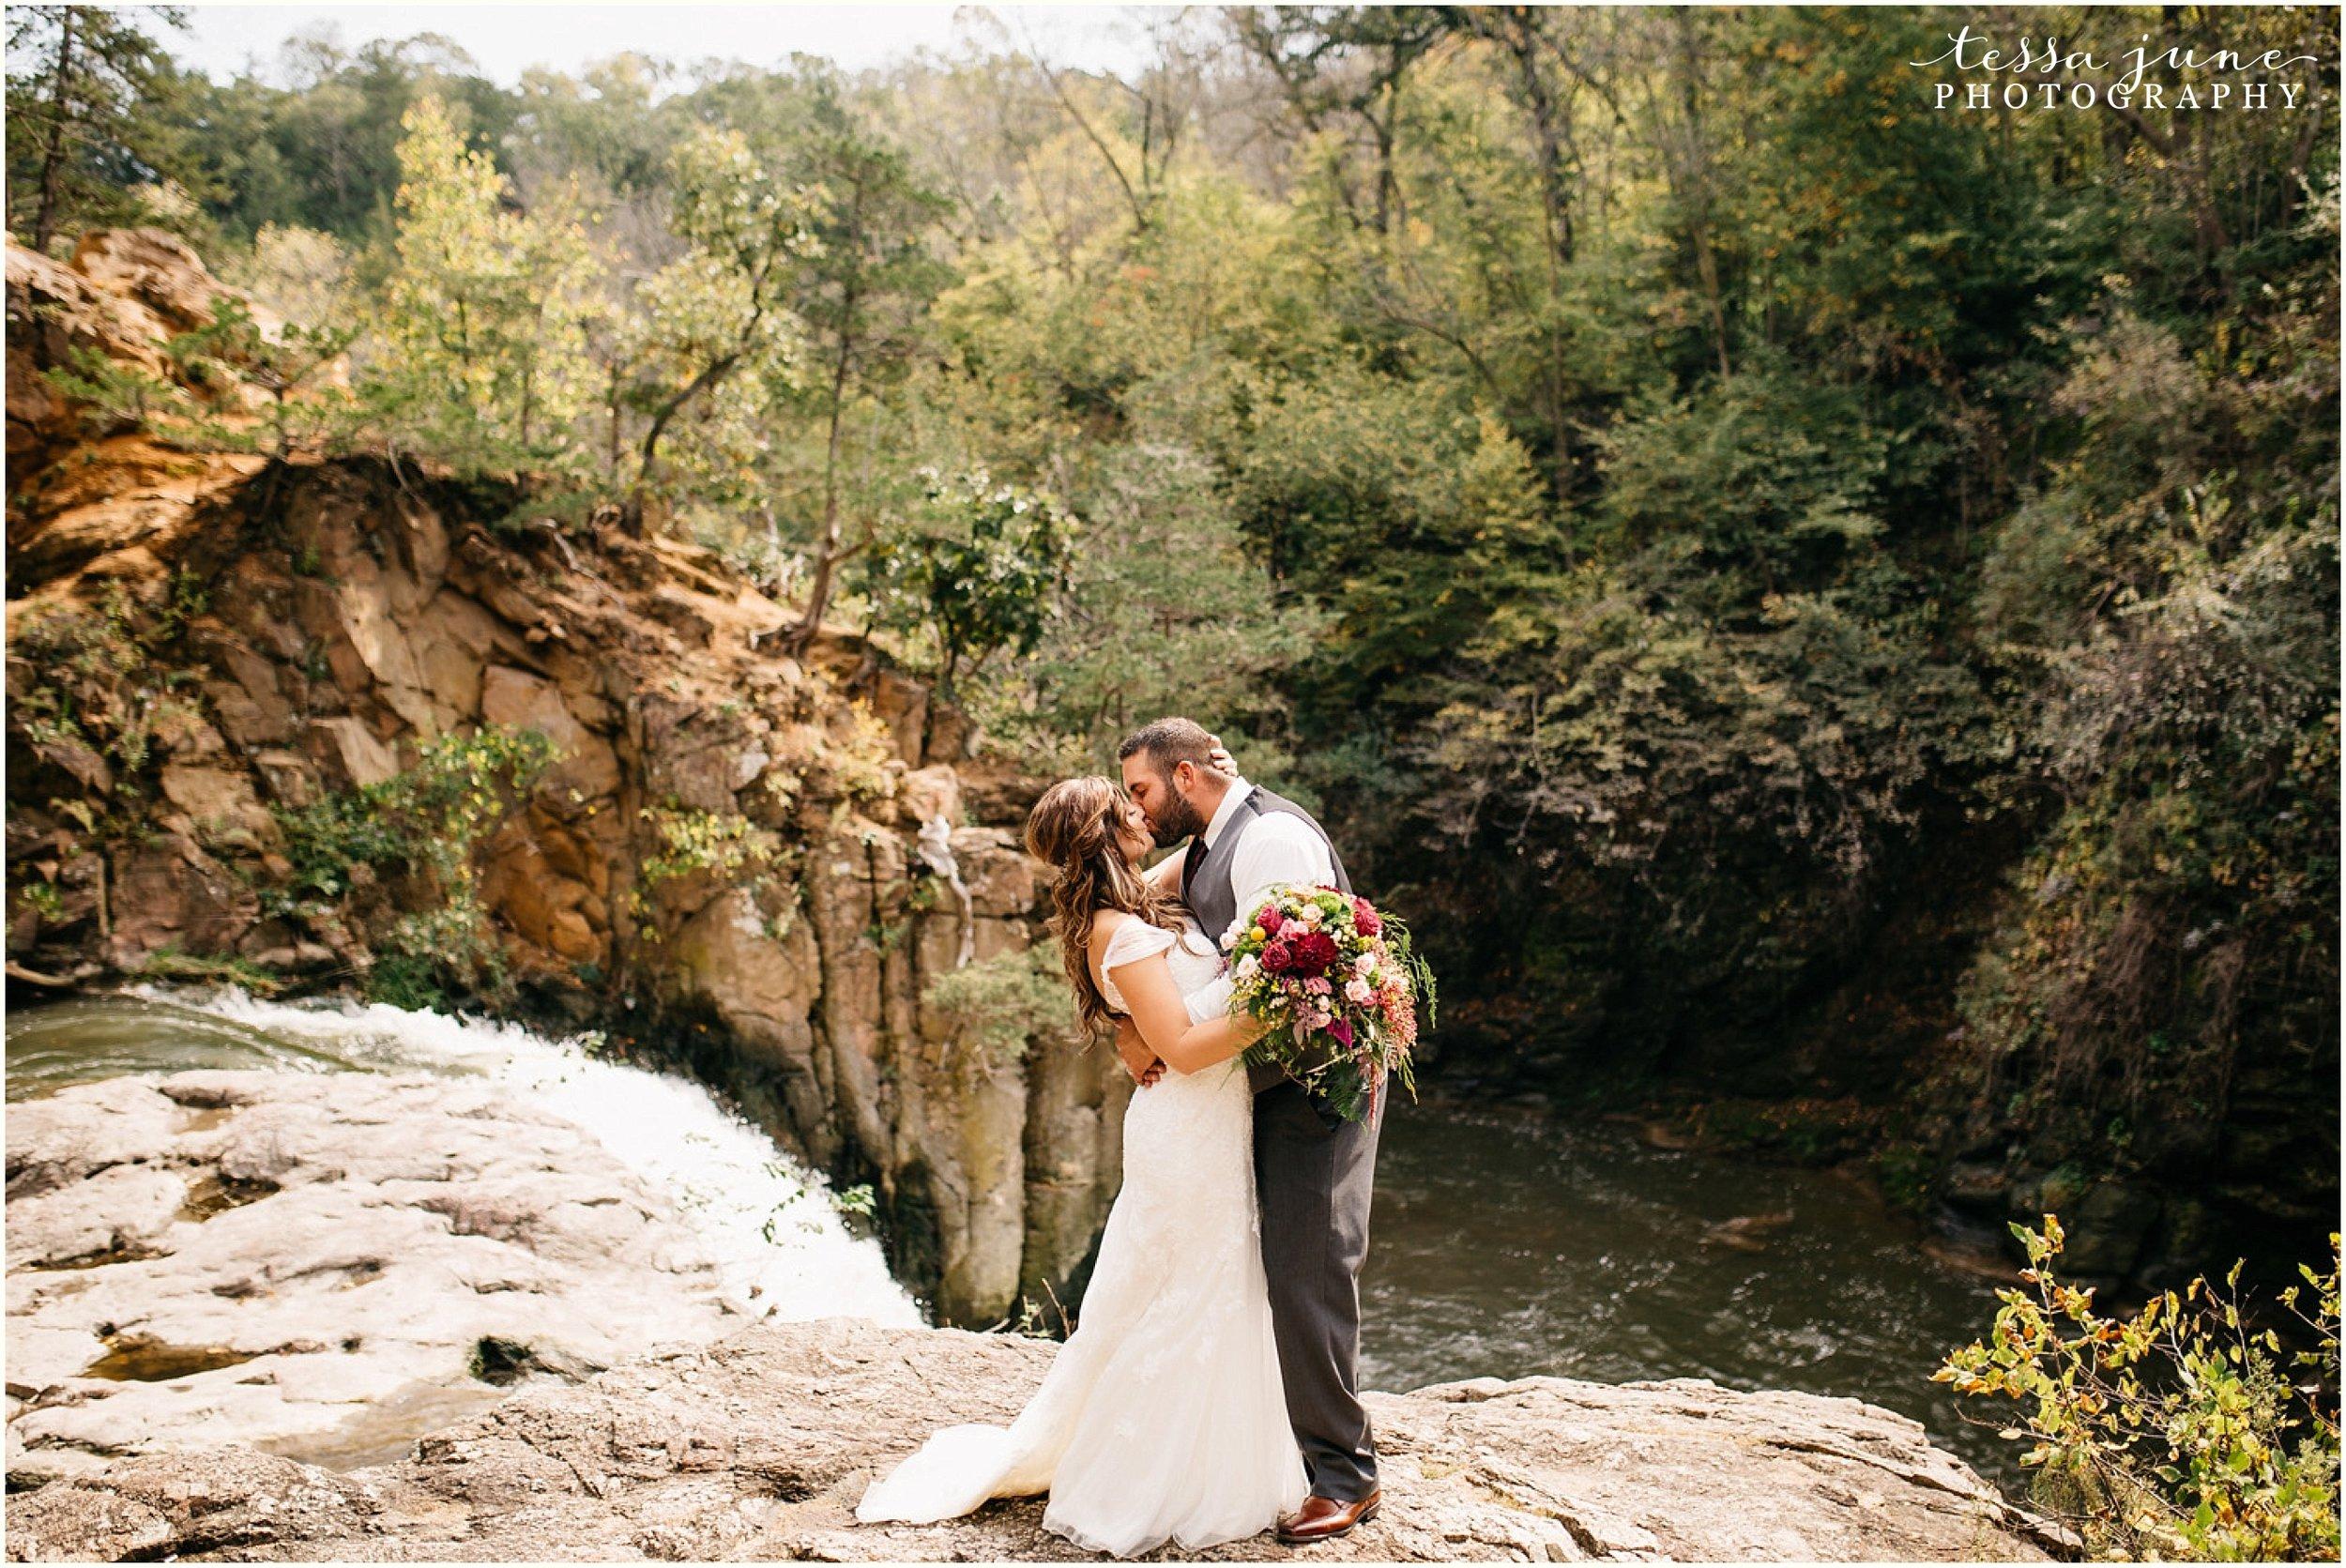 bohemian-minnesota-wedding-mismatched-bridesmaid-dresses-waterfall-st-cloud-tessa-june-photography-62.jpg